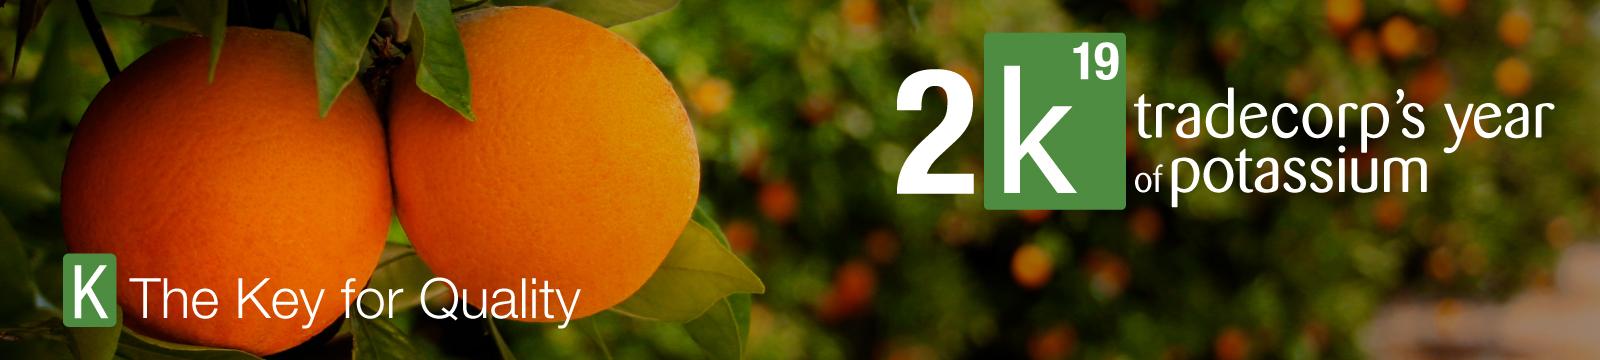 2K19, Tradecorp's year of Potassium